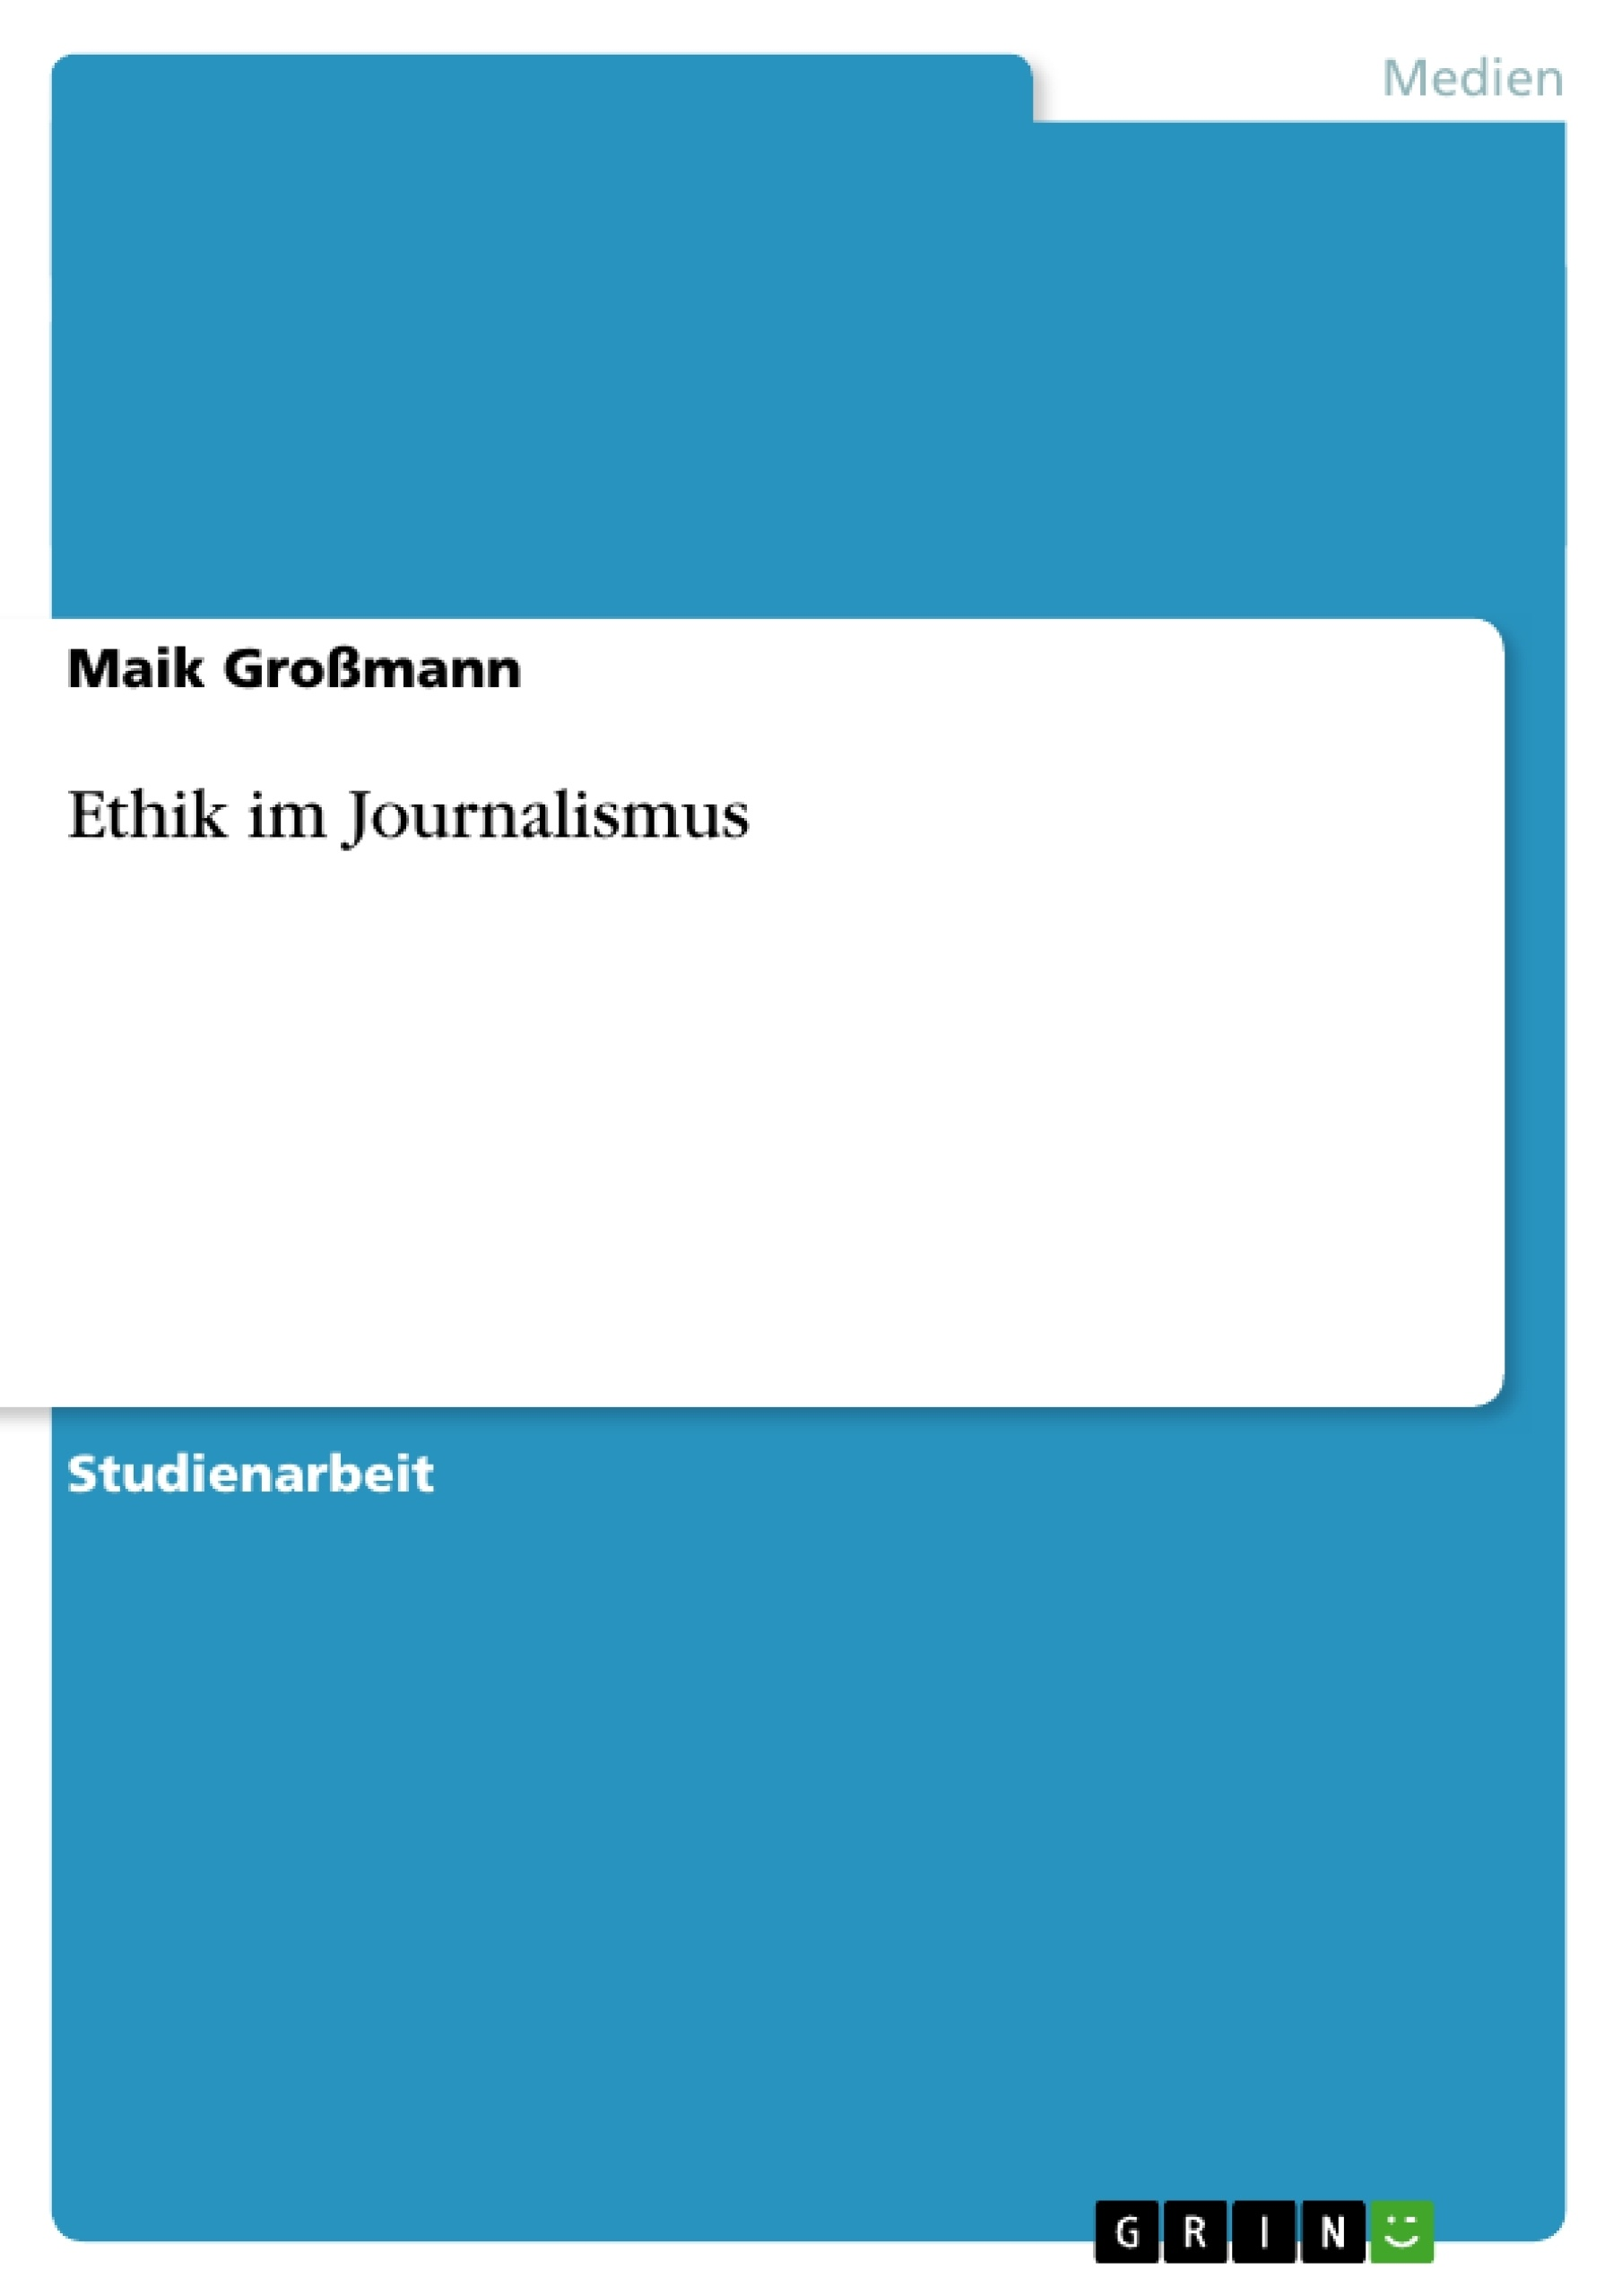 Titel: Ethik im Journalismus